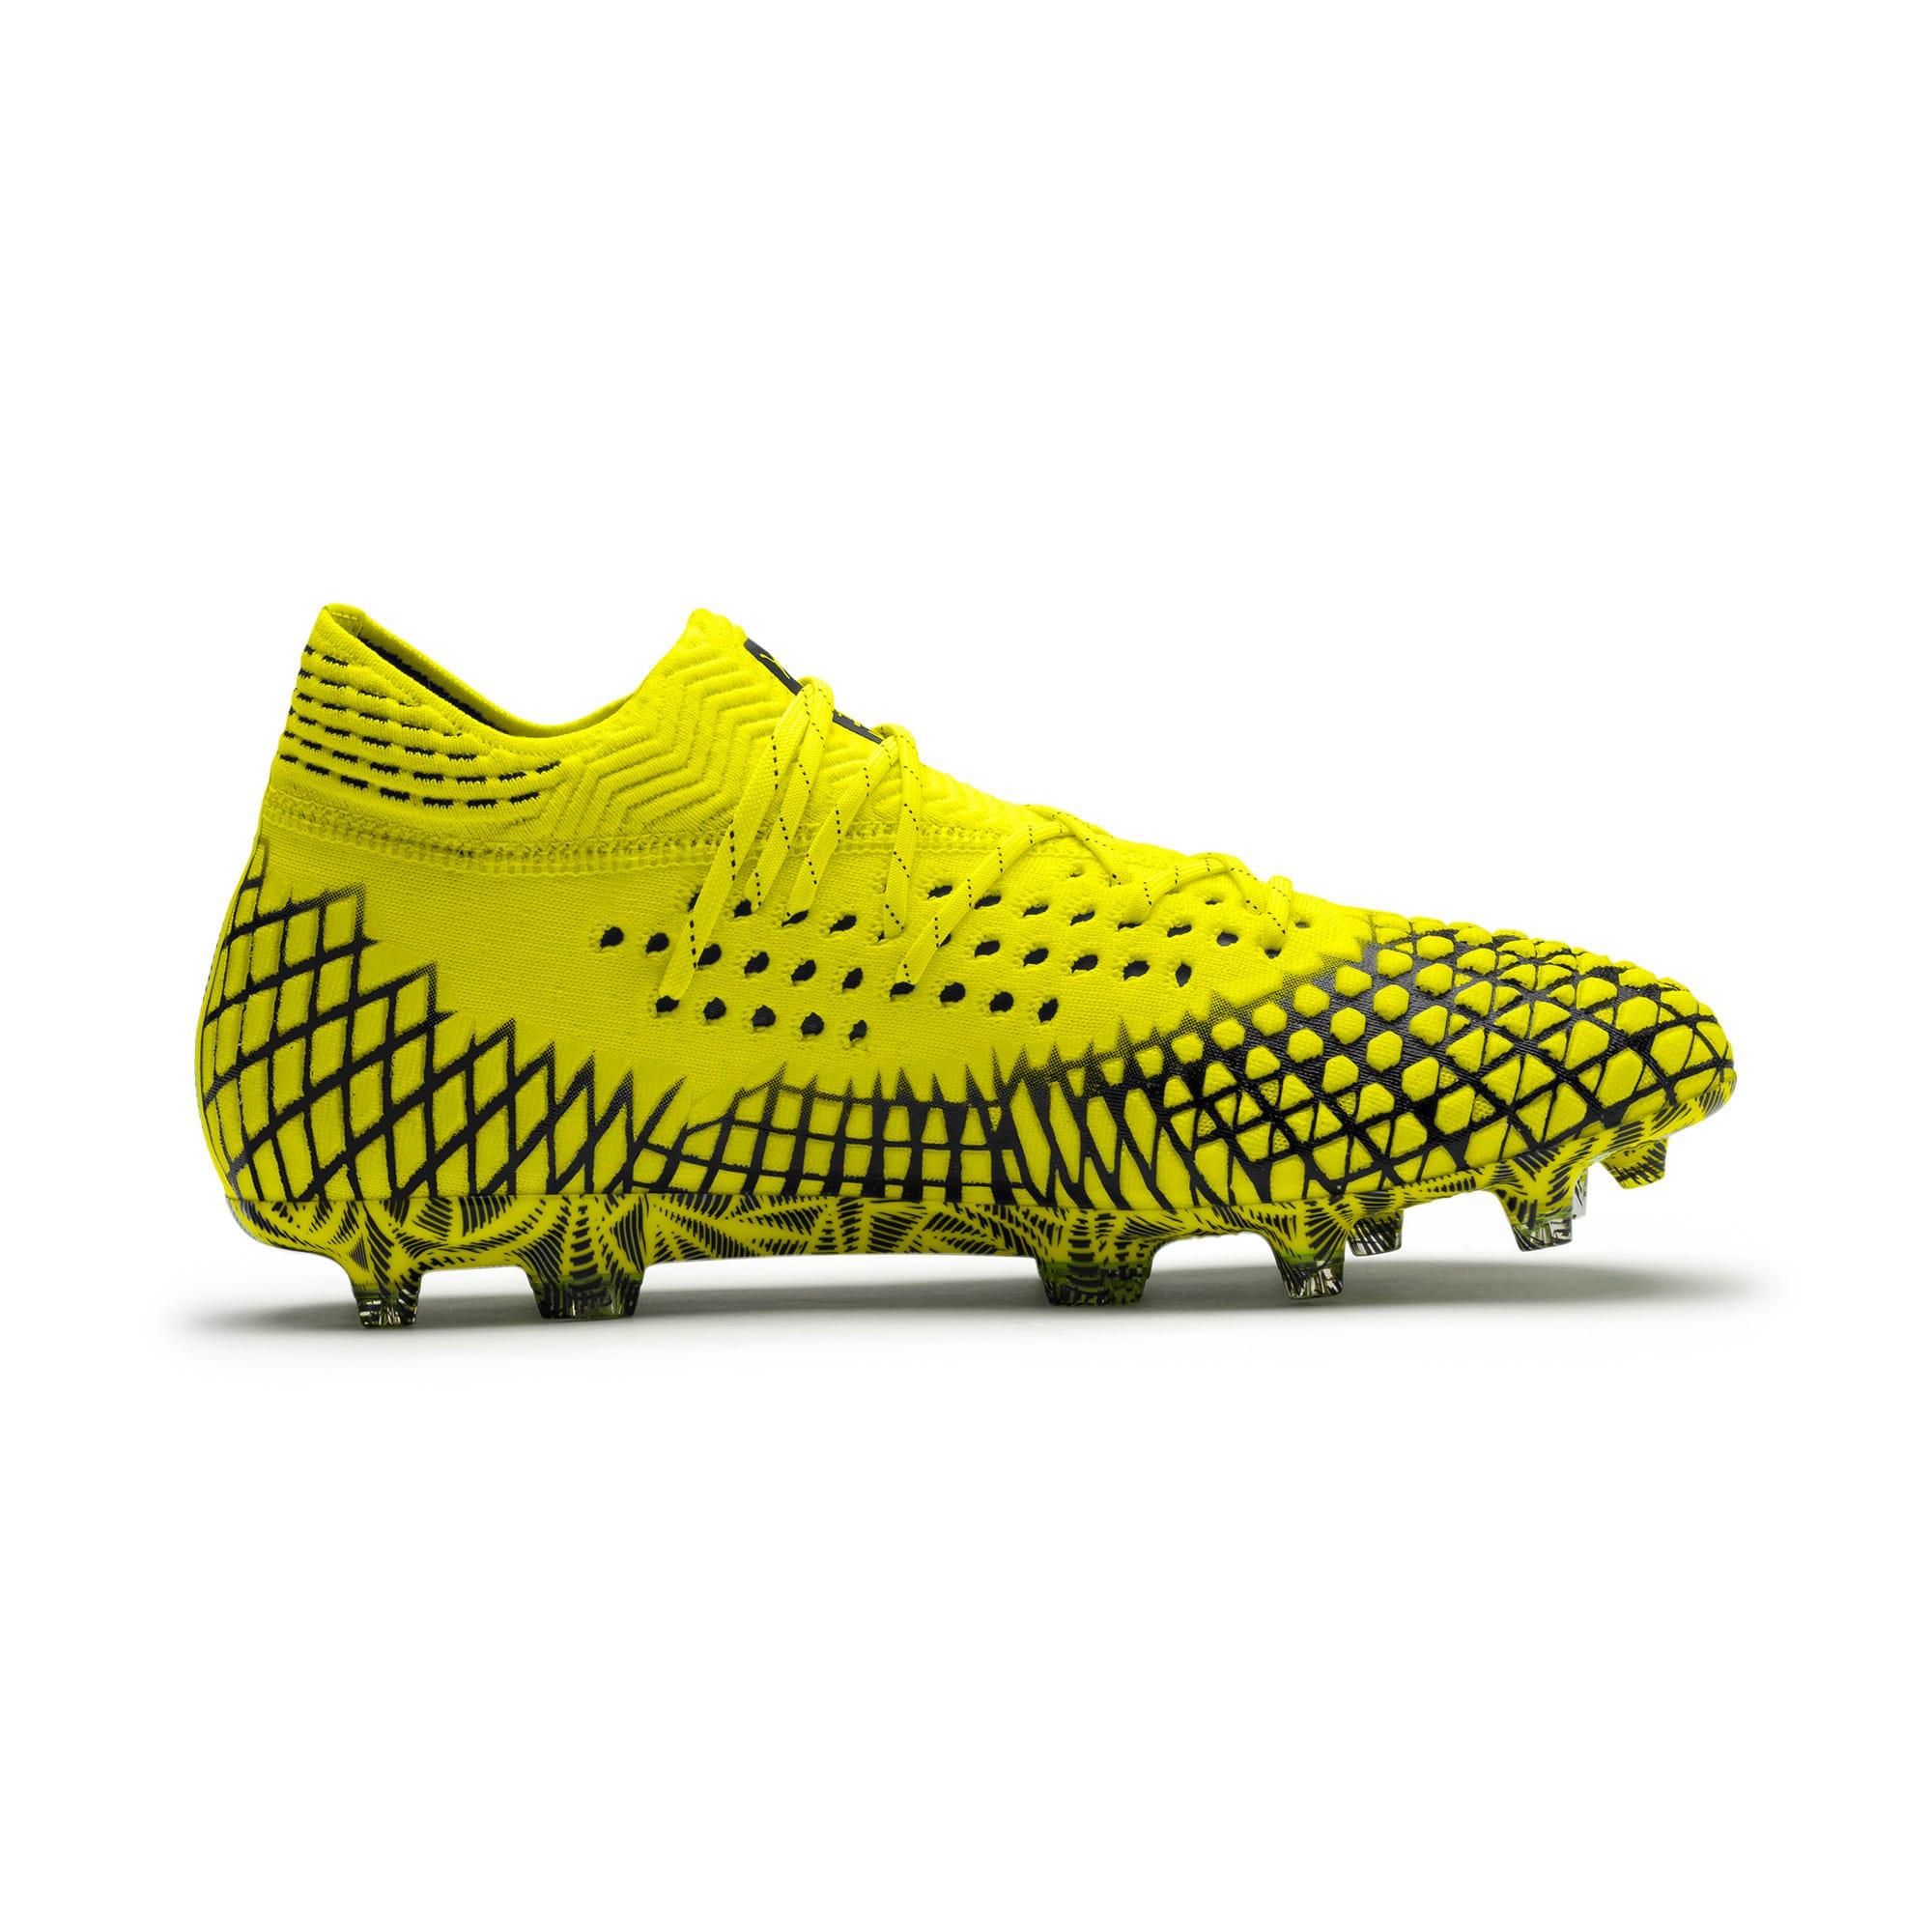 Thumbnail 5 of FUTURE 4.1 NETFIT FG/AG Men's Soccer Cleats, Yellow Alert-Puma Black, medium